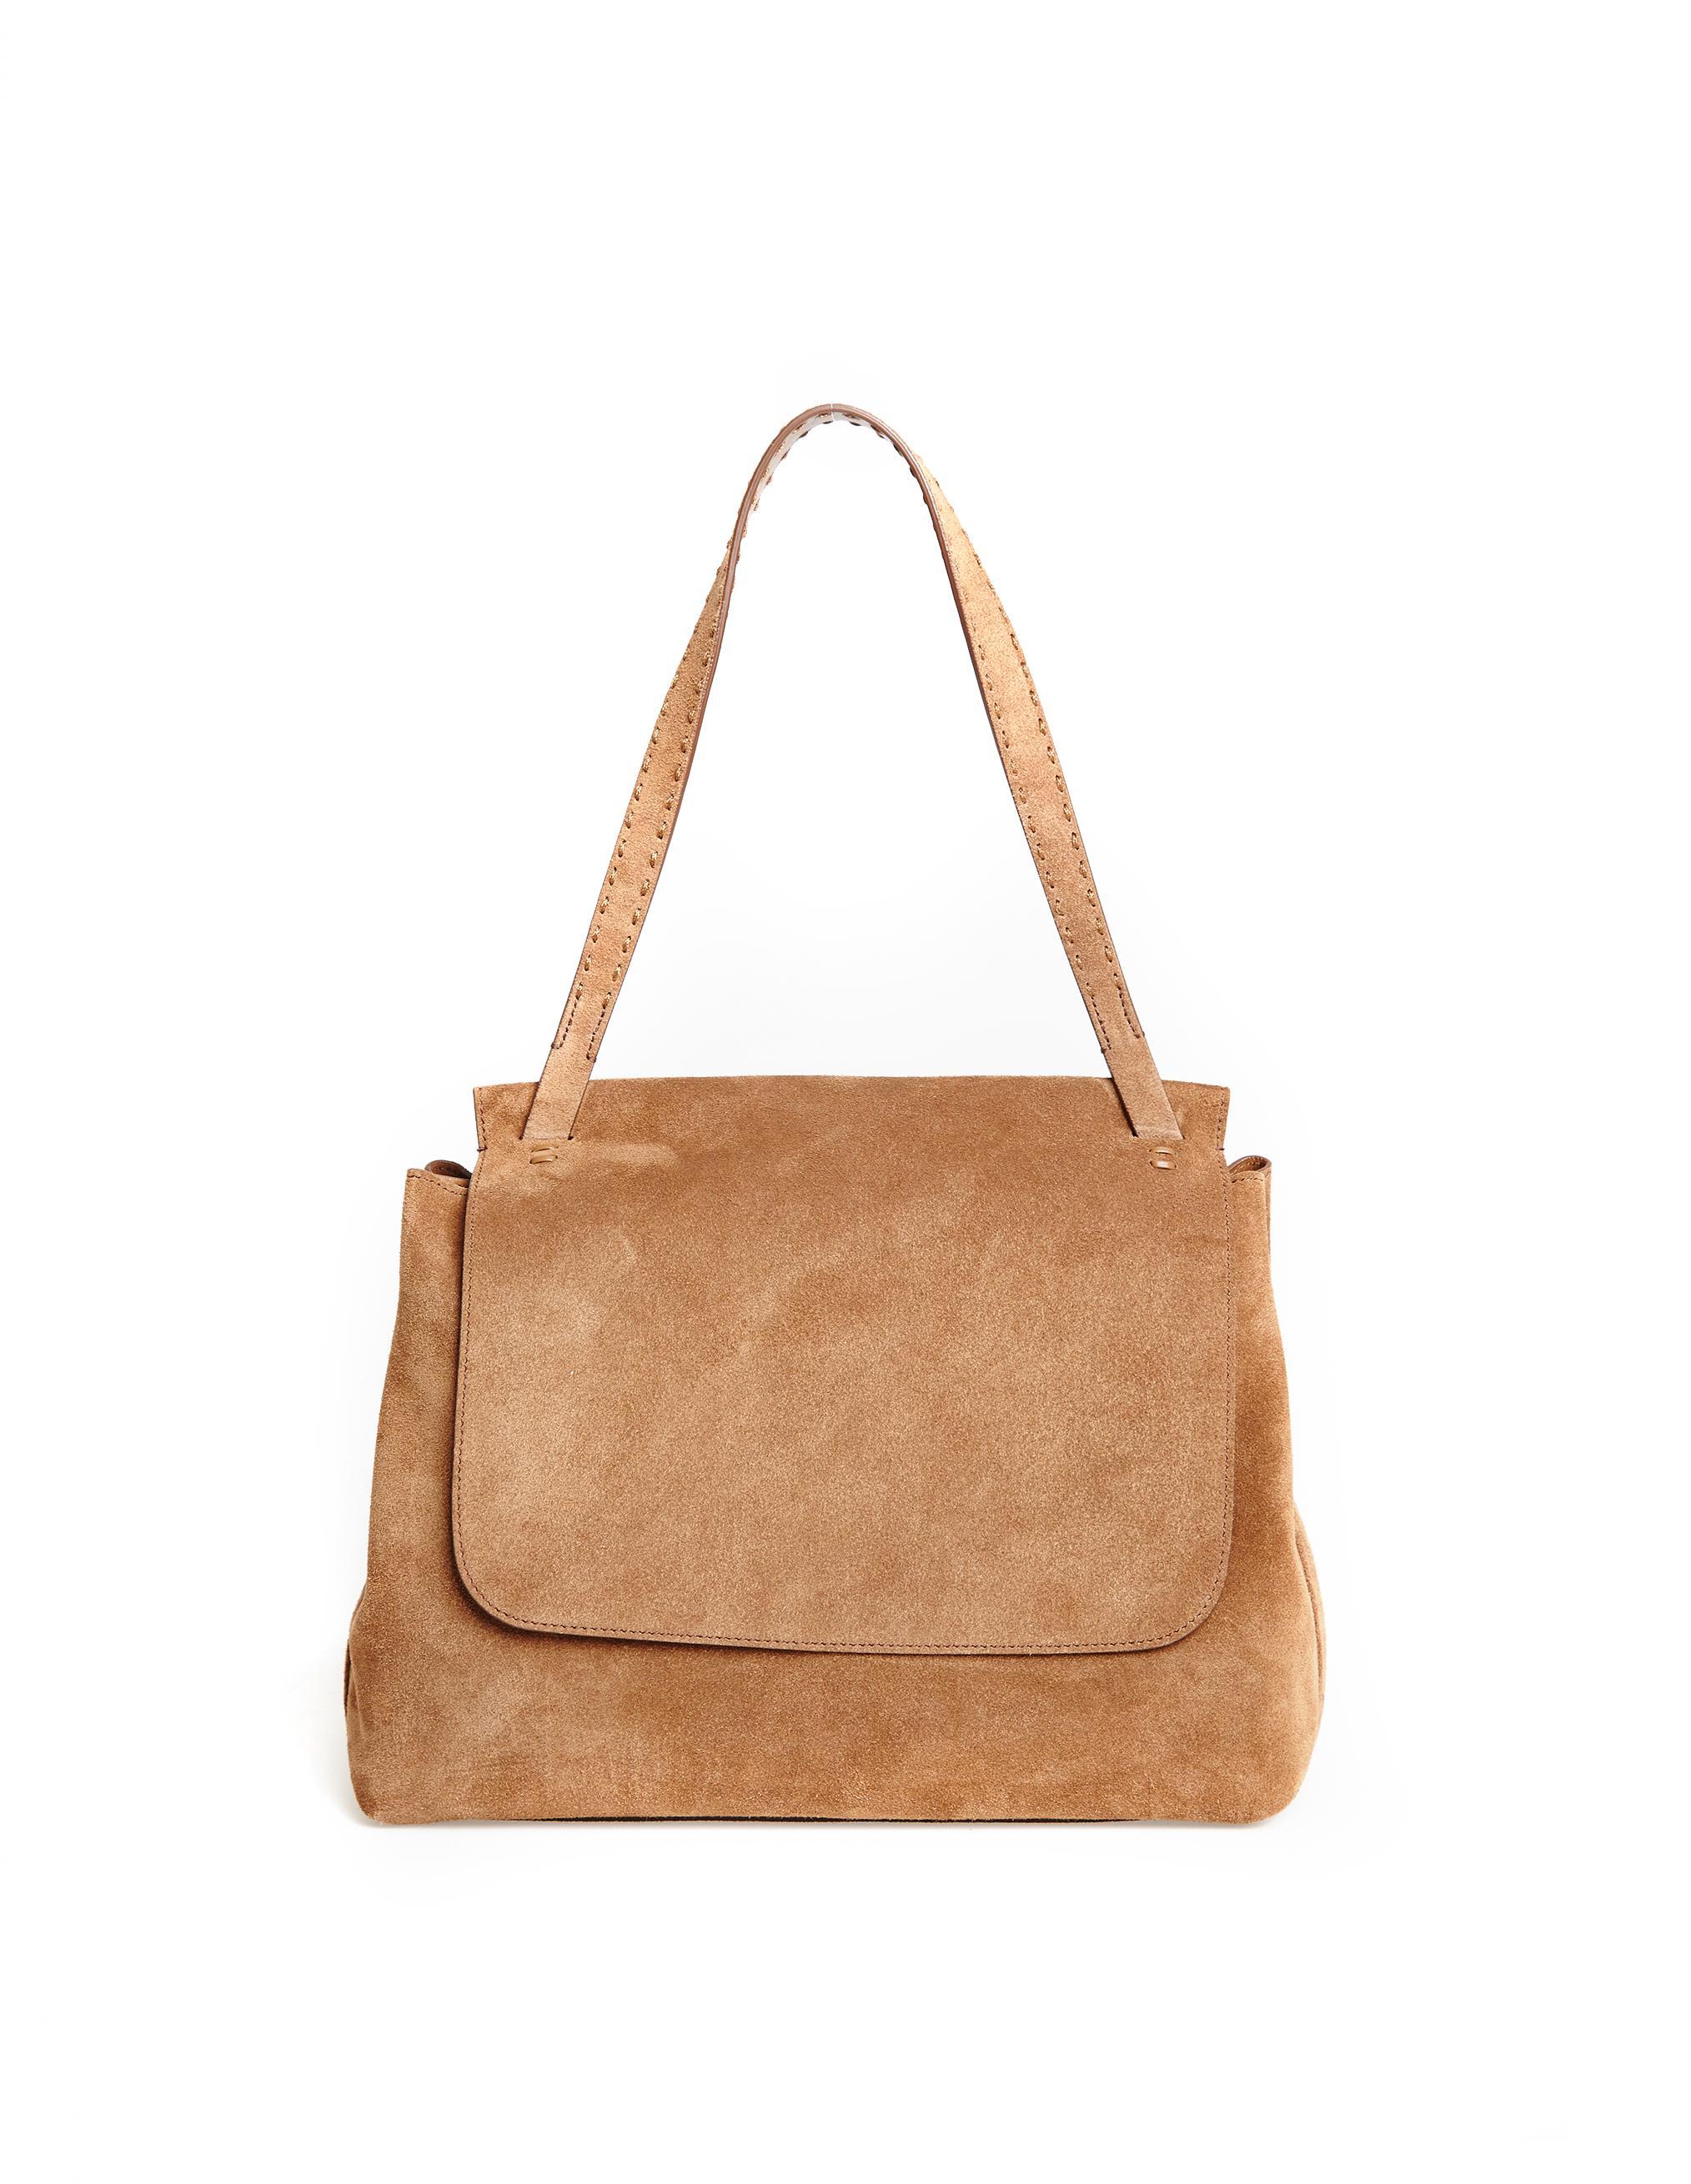 342ddd64fbcd Lyst - The Row Sidekick Suede Bag in Brown